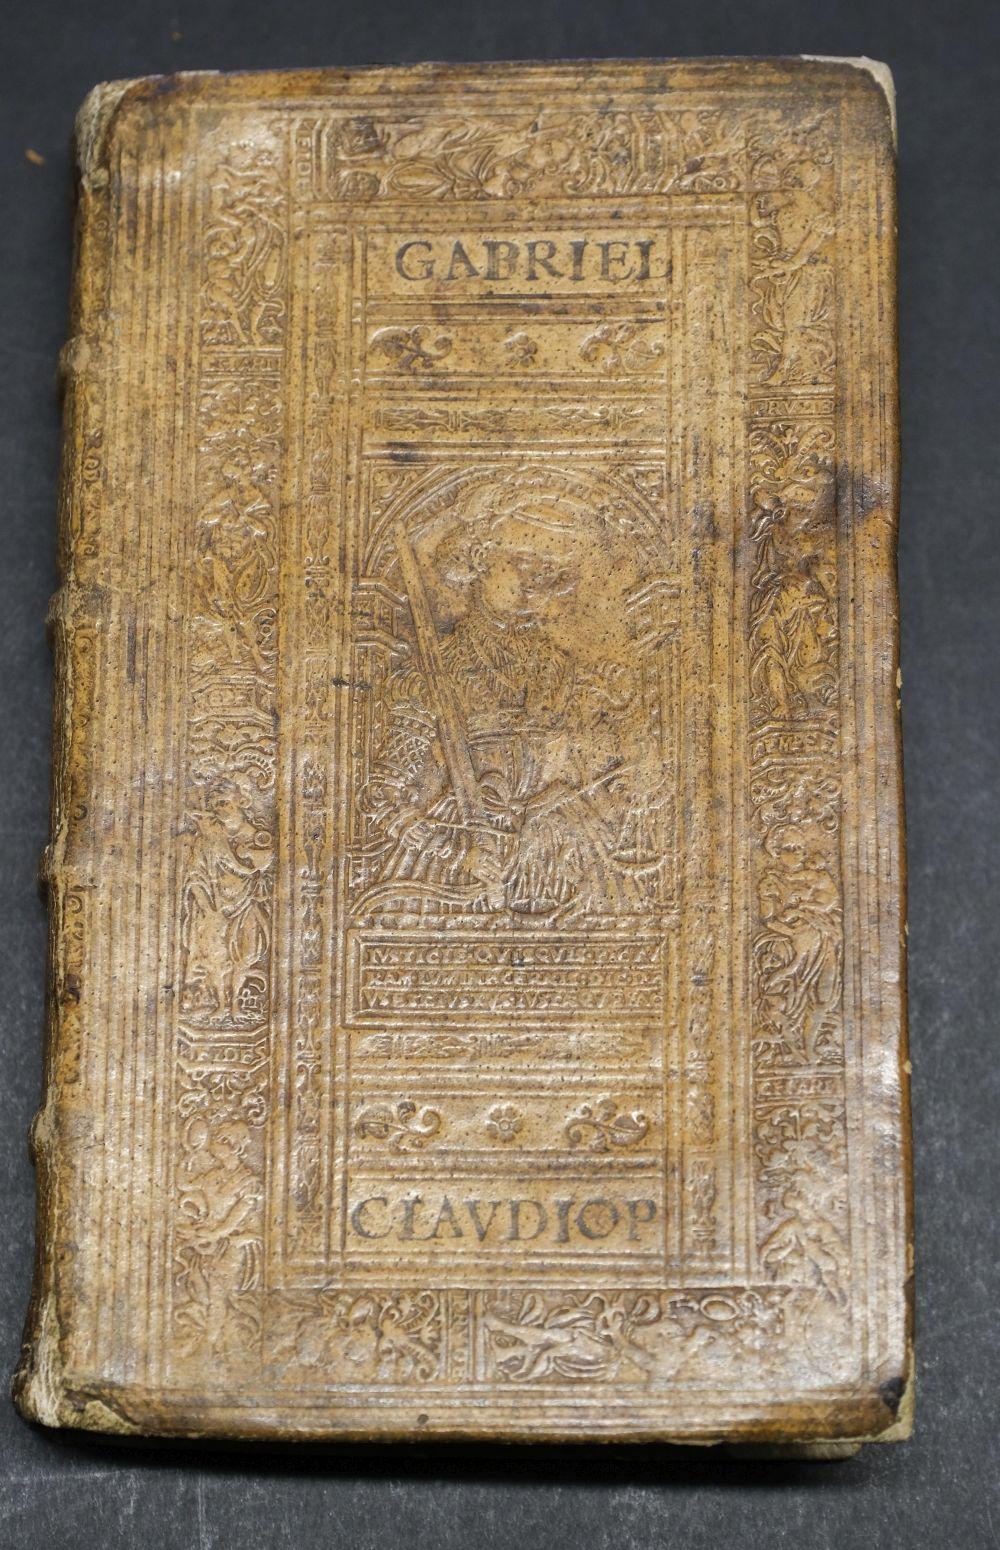 Sambucus (Joannes). Emblemata, Antwerp: Christopher Plantin, 1564 - Image 3 of 11